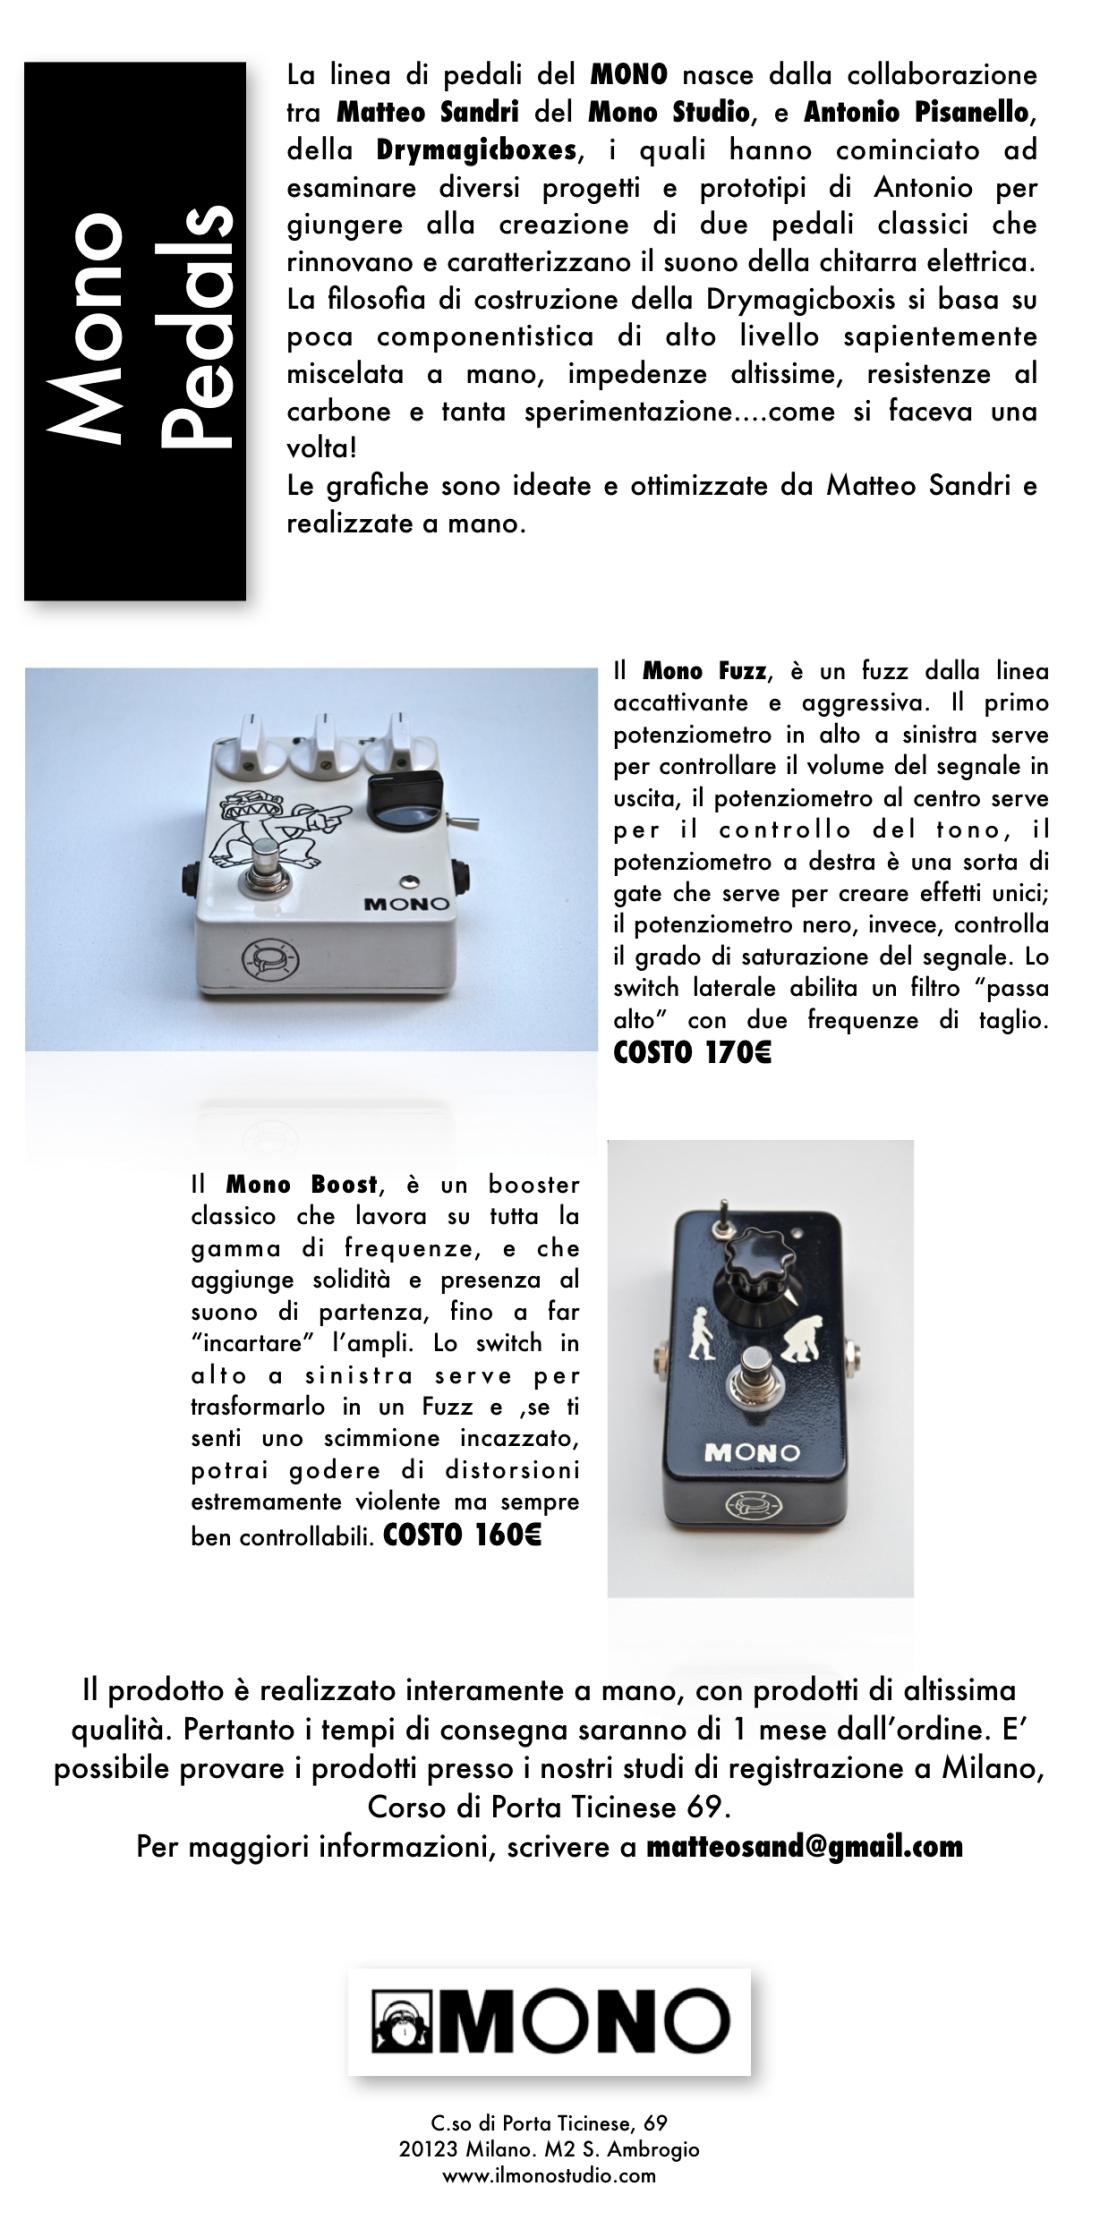 mono-guitar-pedals-brochure1